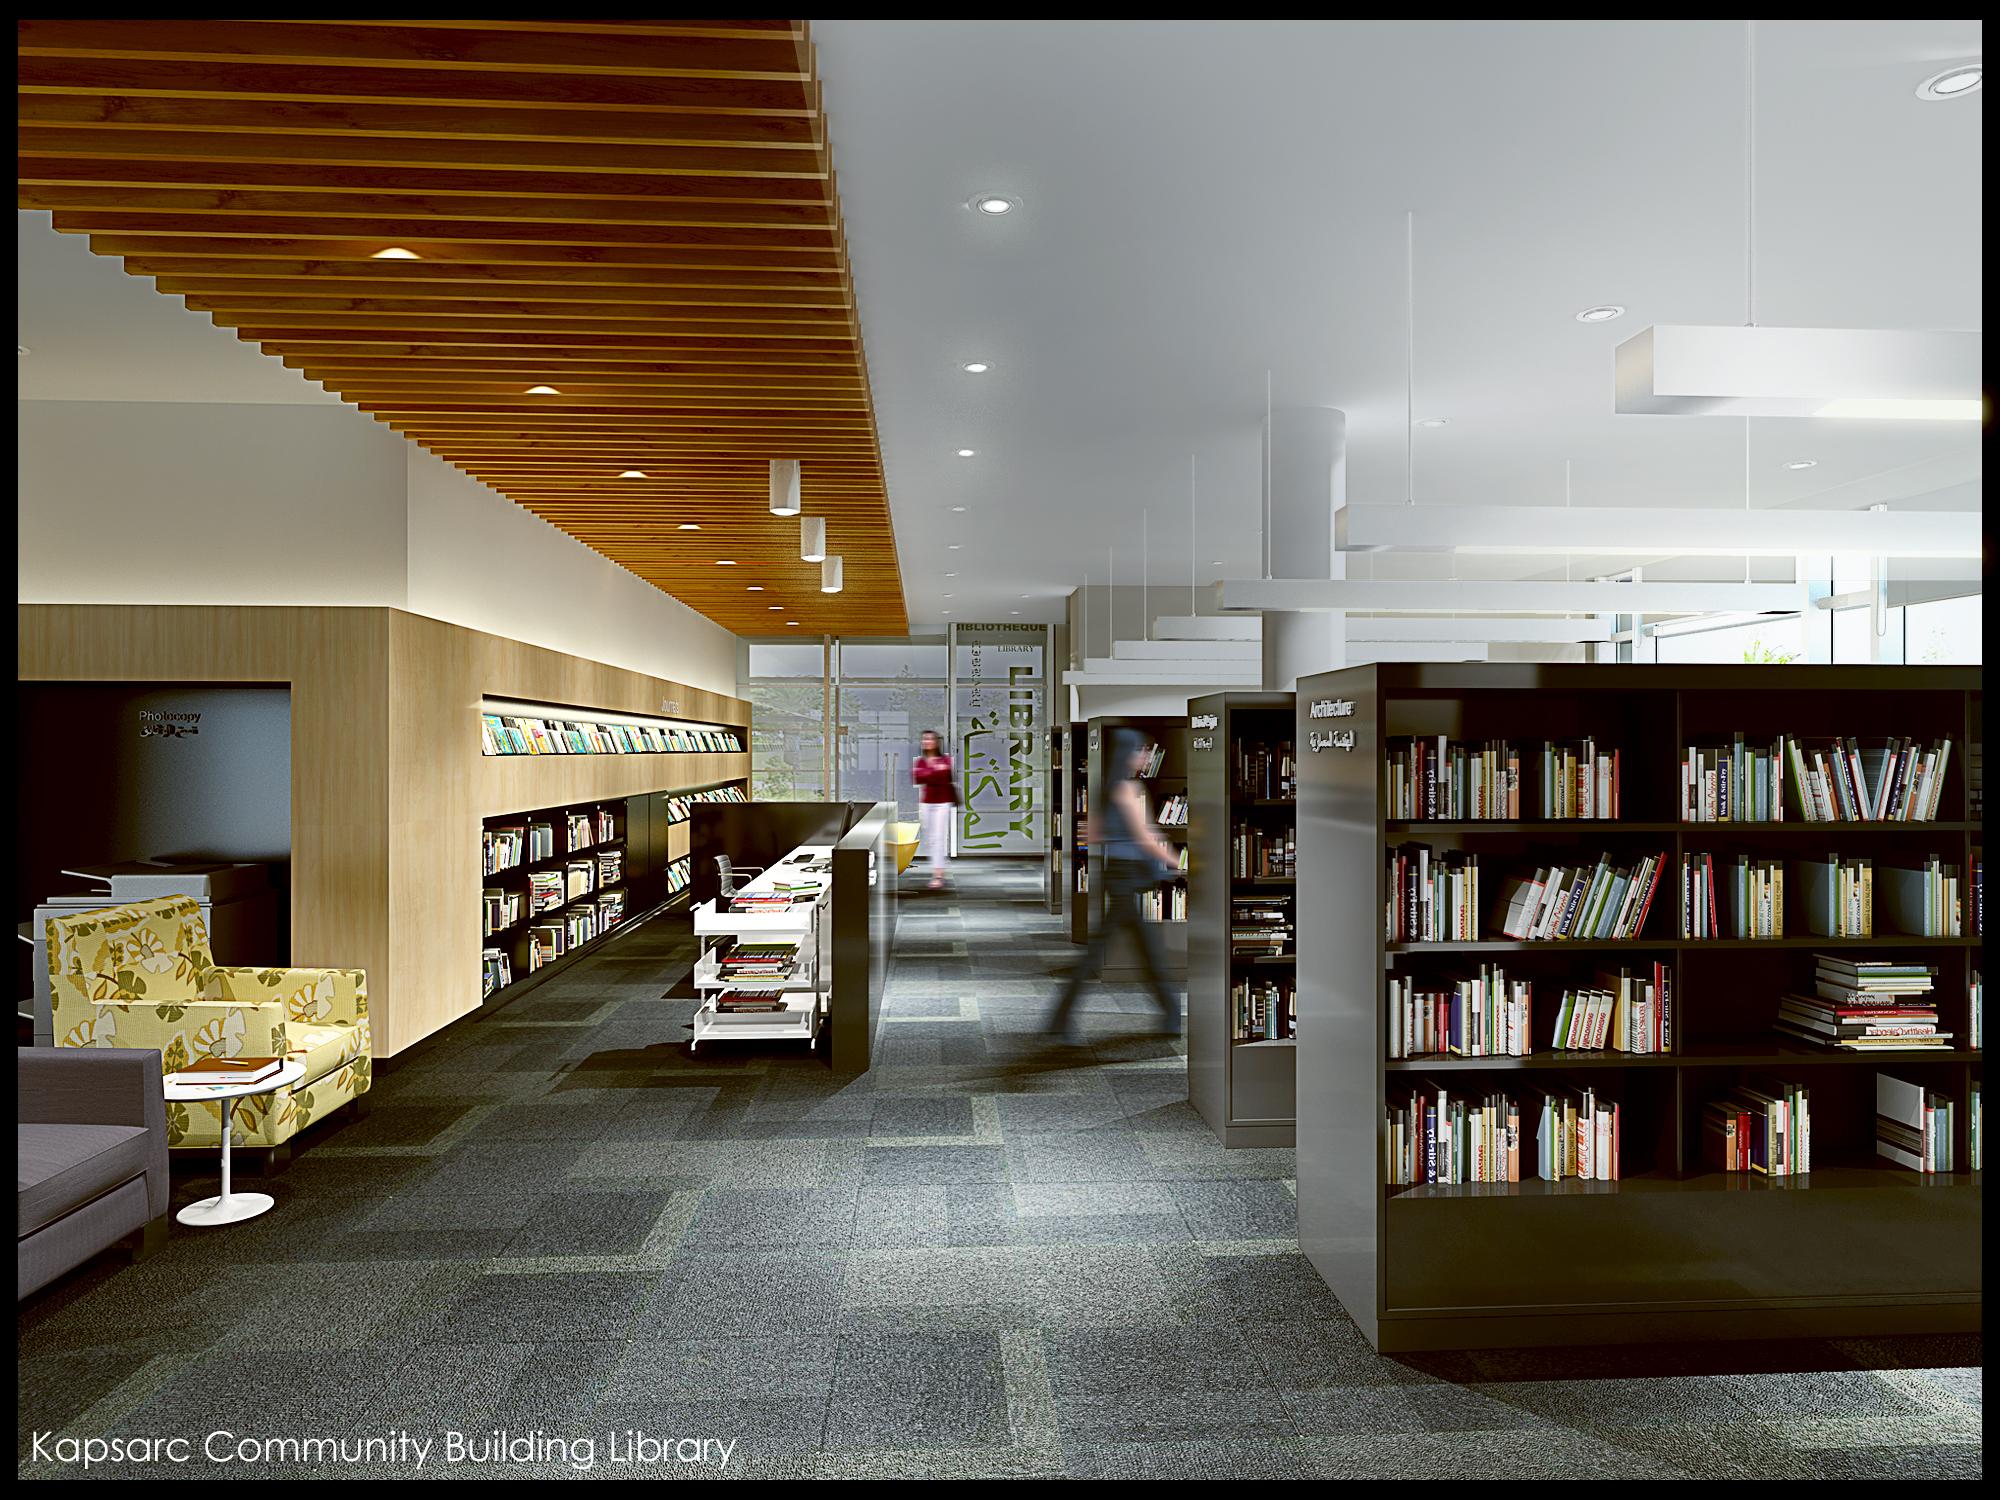 Kapsarc Community Building Library.jpg